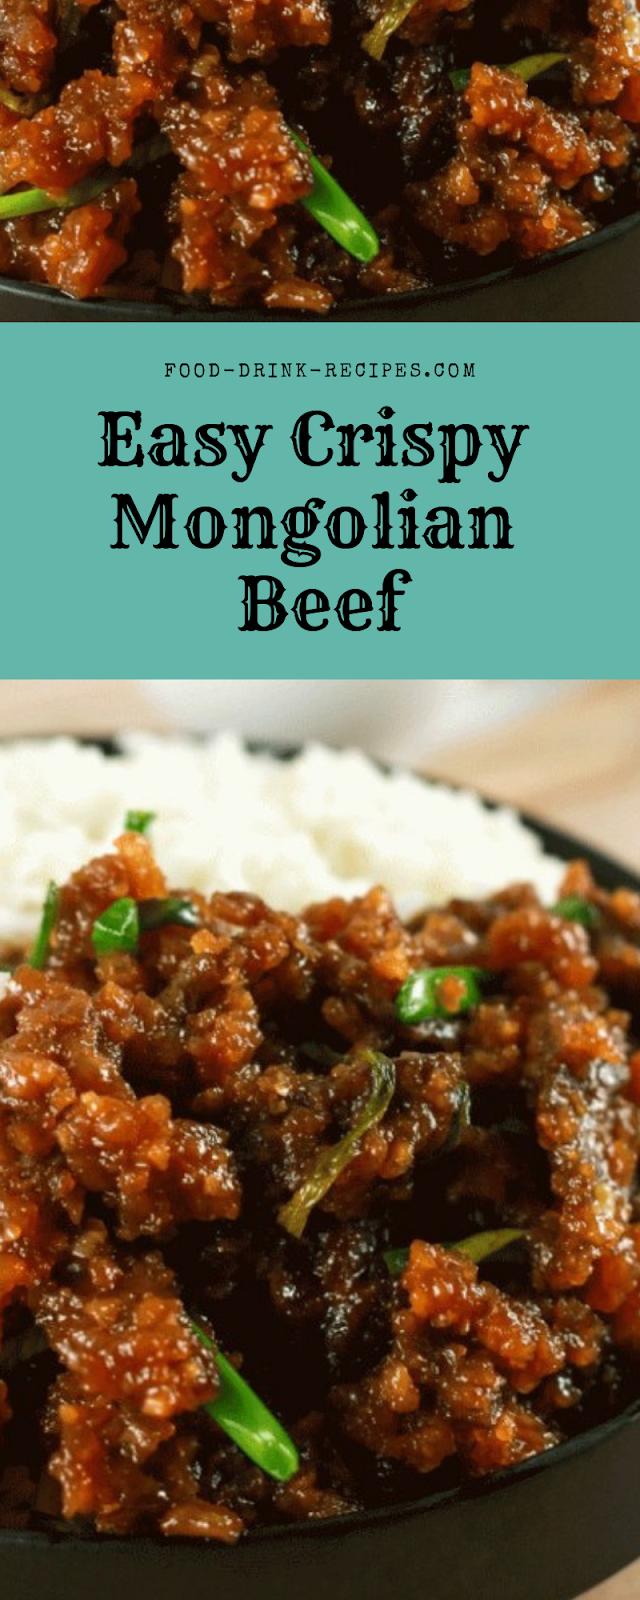 Easy Crispy Mongolian Beef  - food-drink-recipes.com